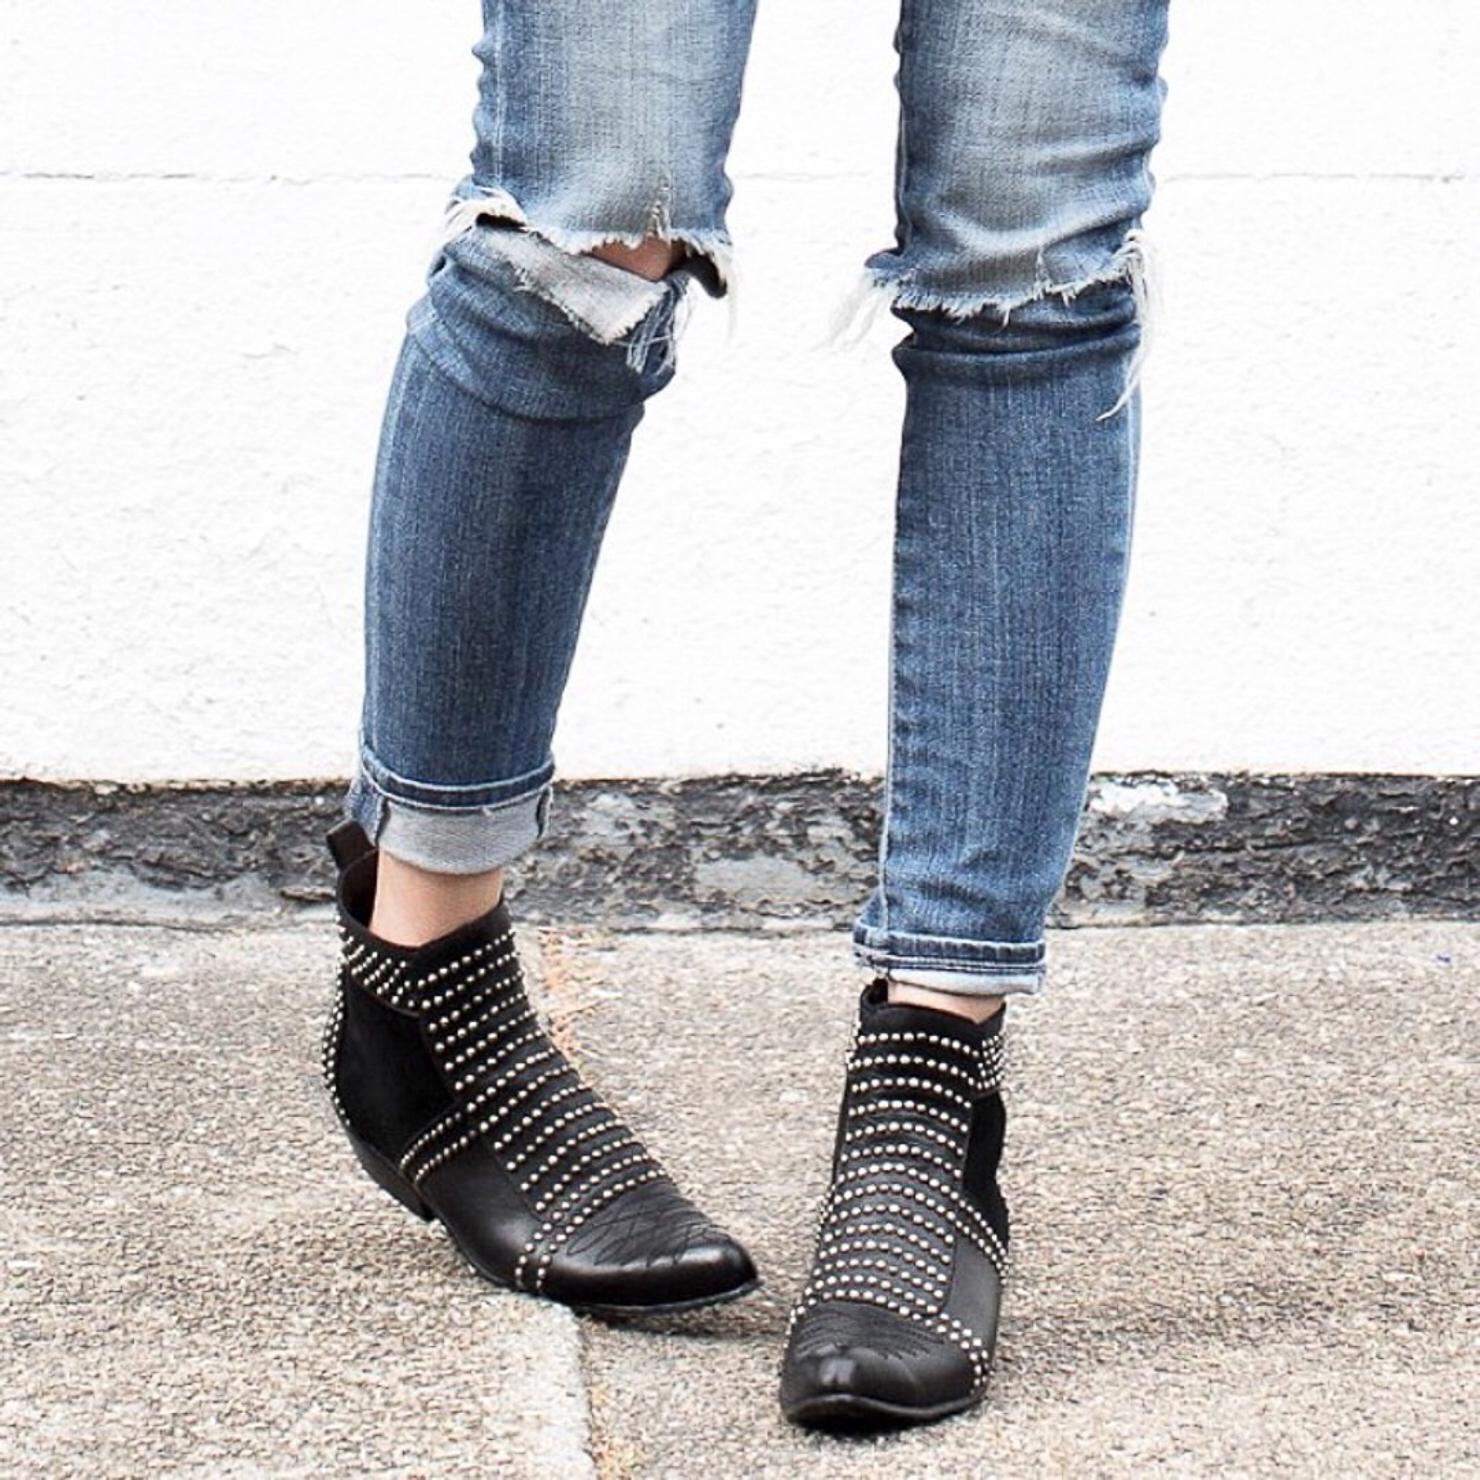 anine-bing-studded-booties-and